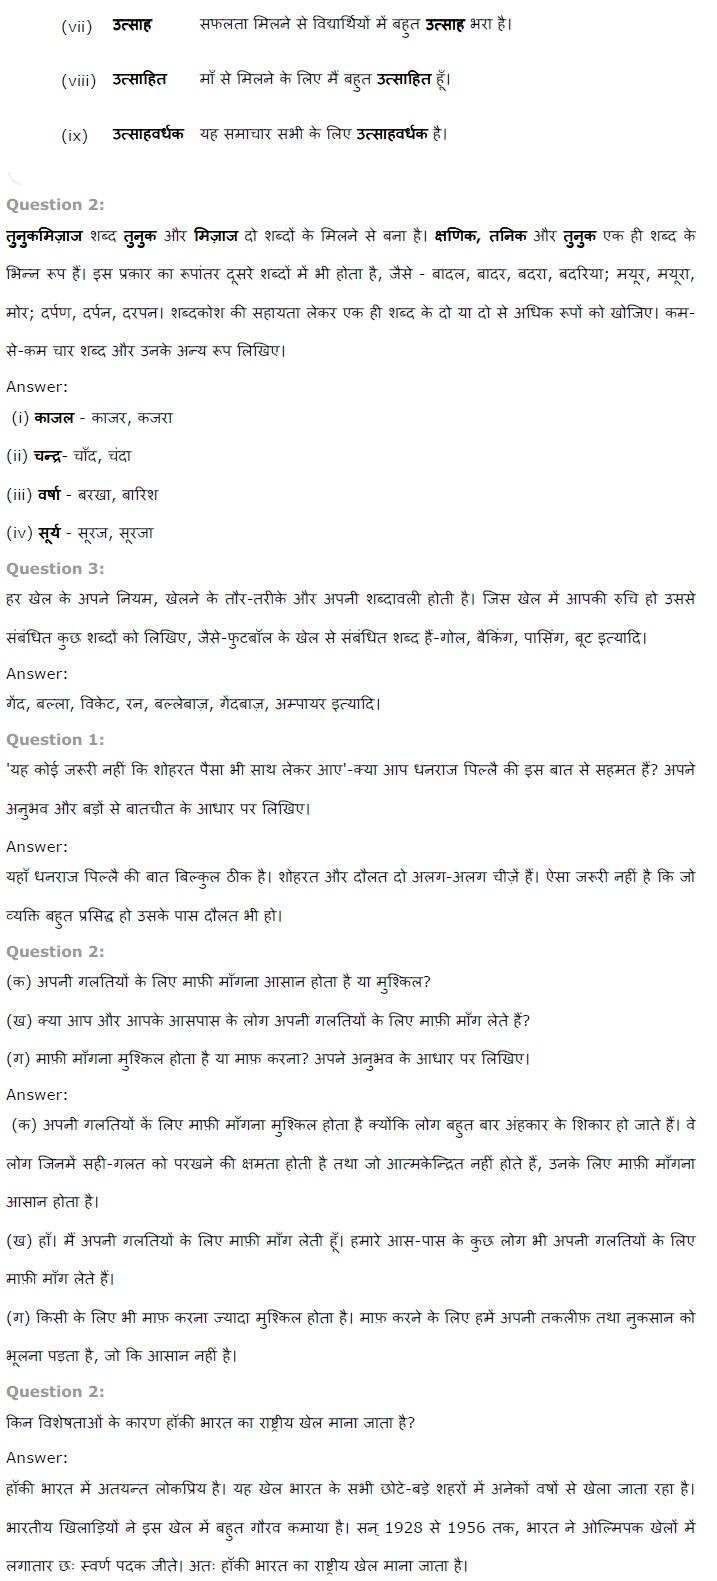 NCERT Solutions for Class 7th Hindi Chapter 18 संघर्ष के कराण मैं तुनुकमिजाज हो गया धनराज